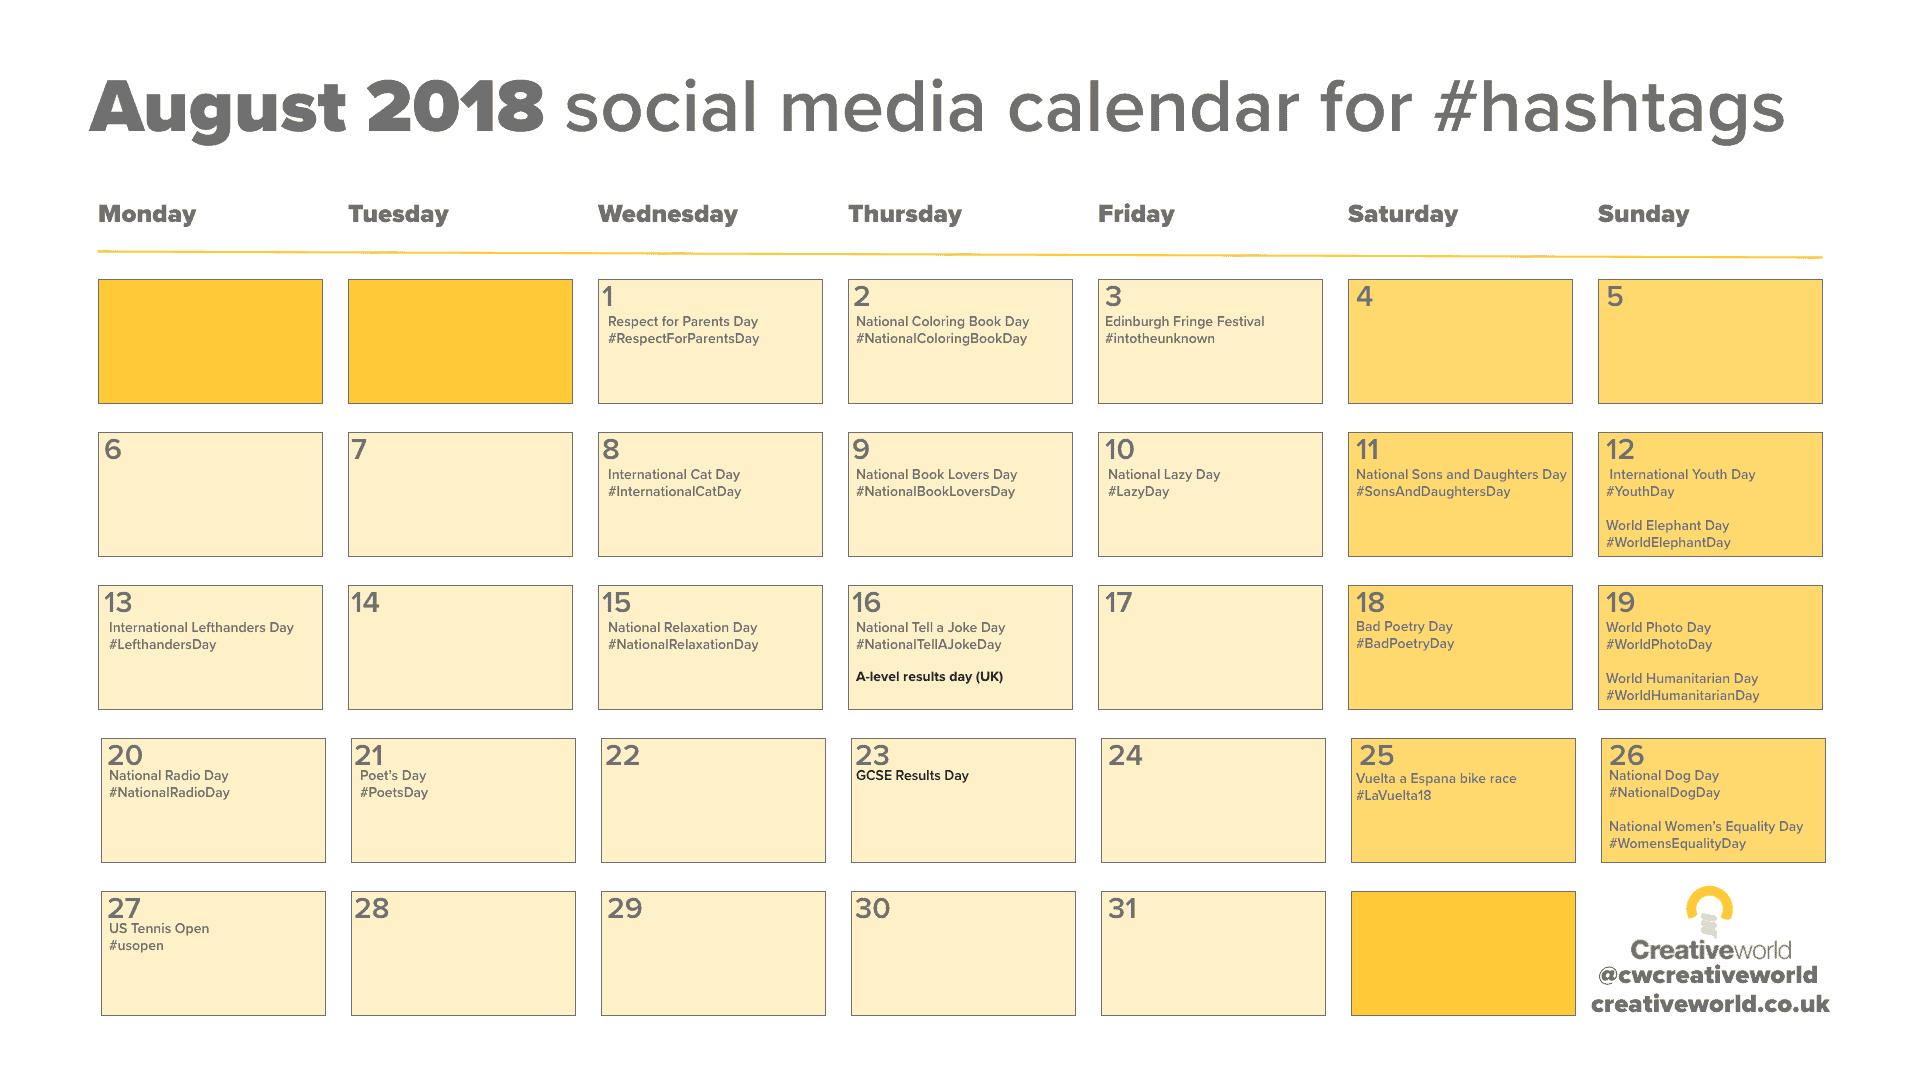 Social Media Calendar - August 2018